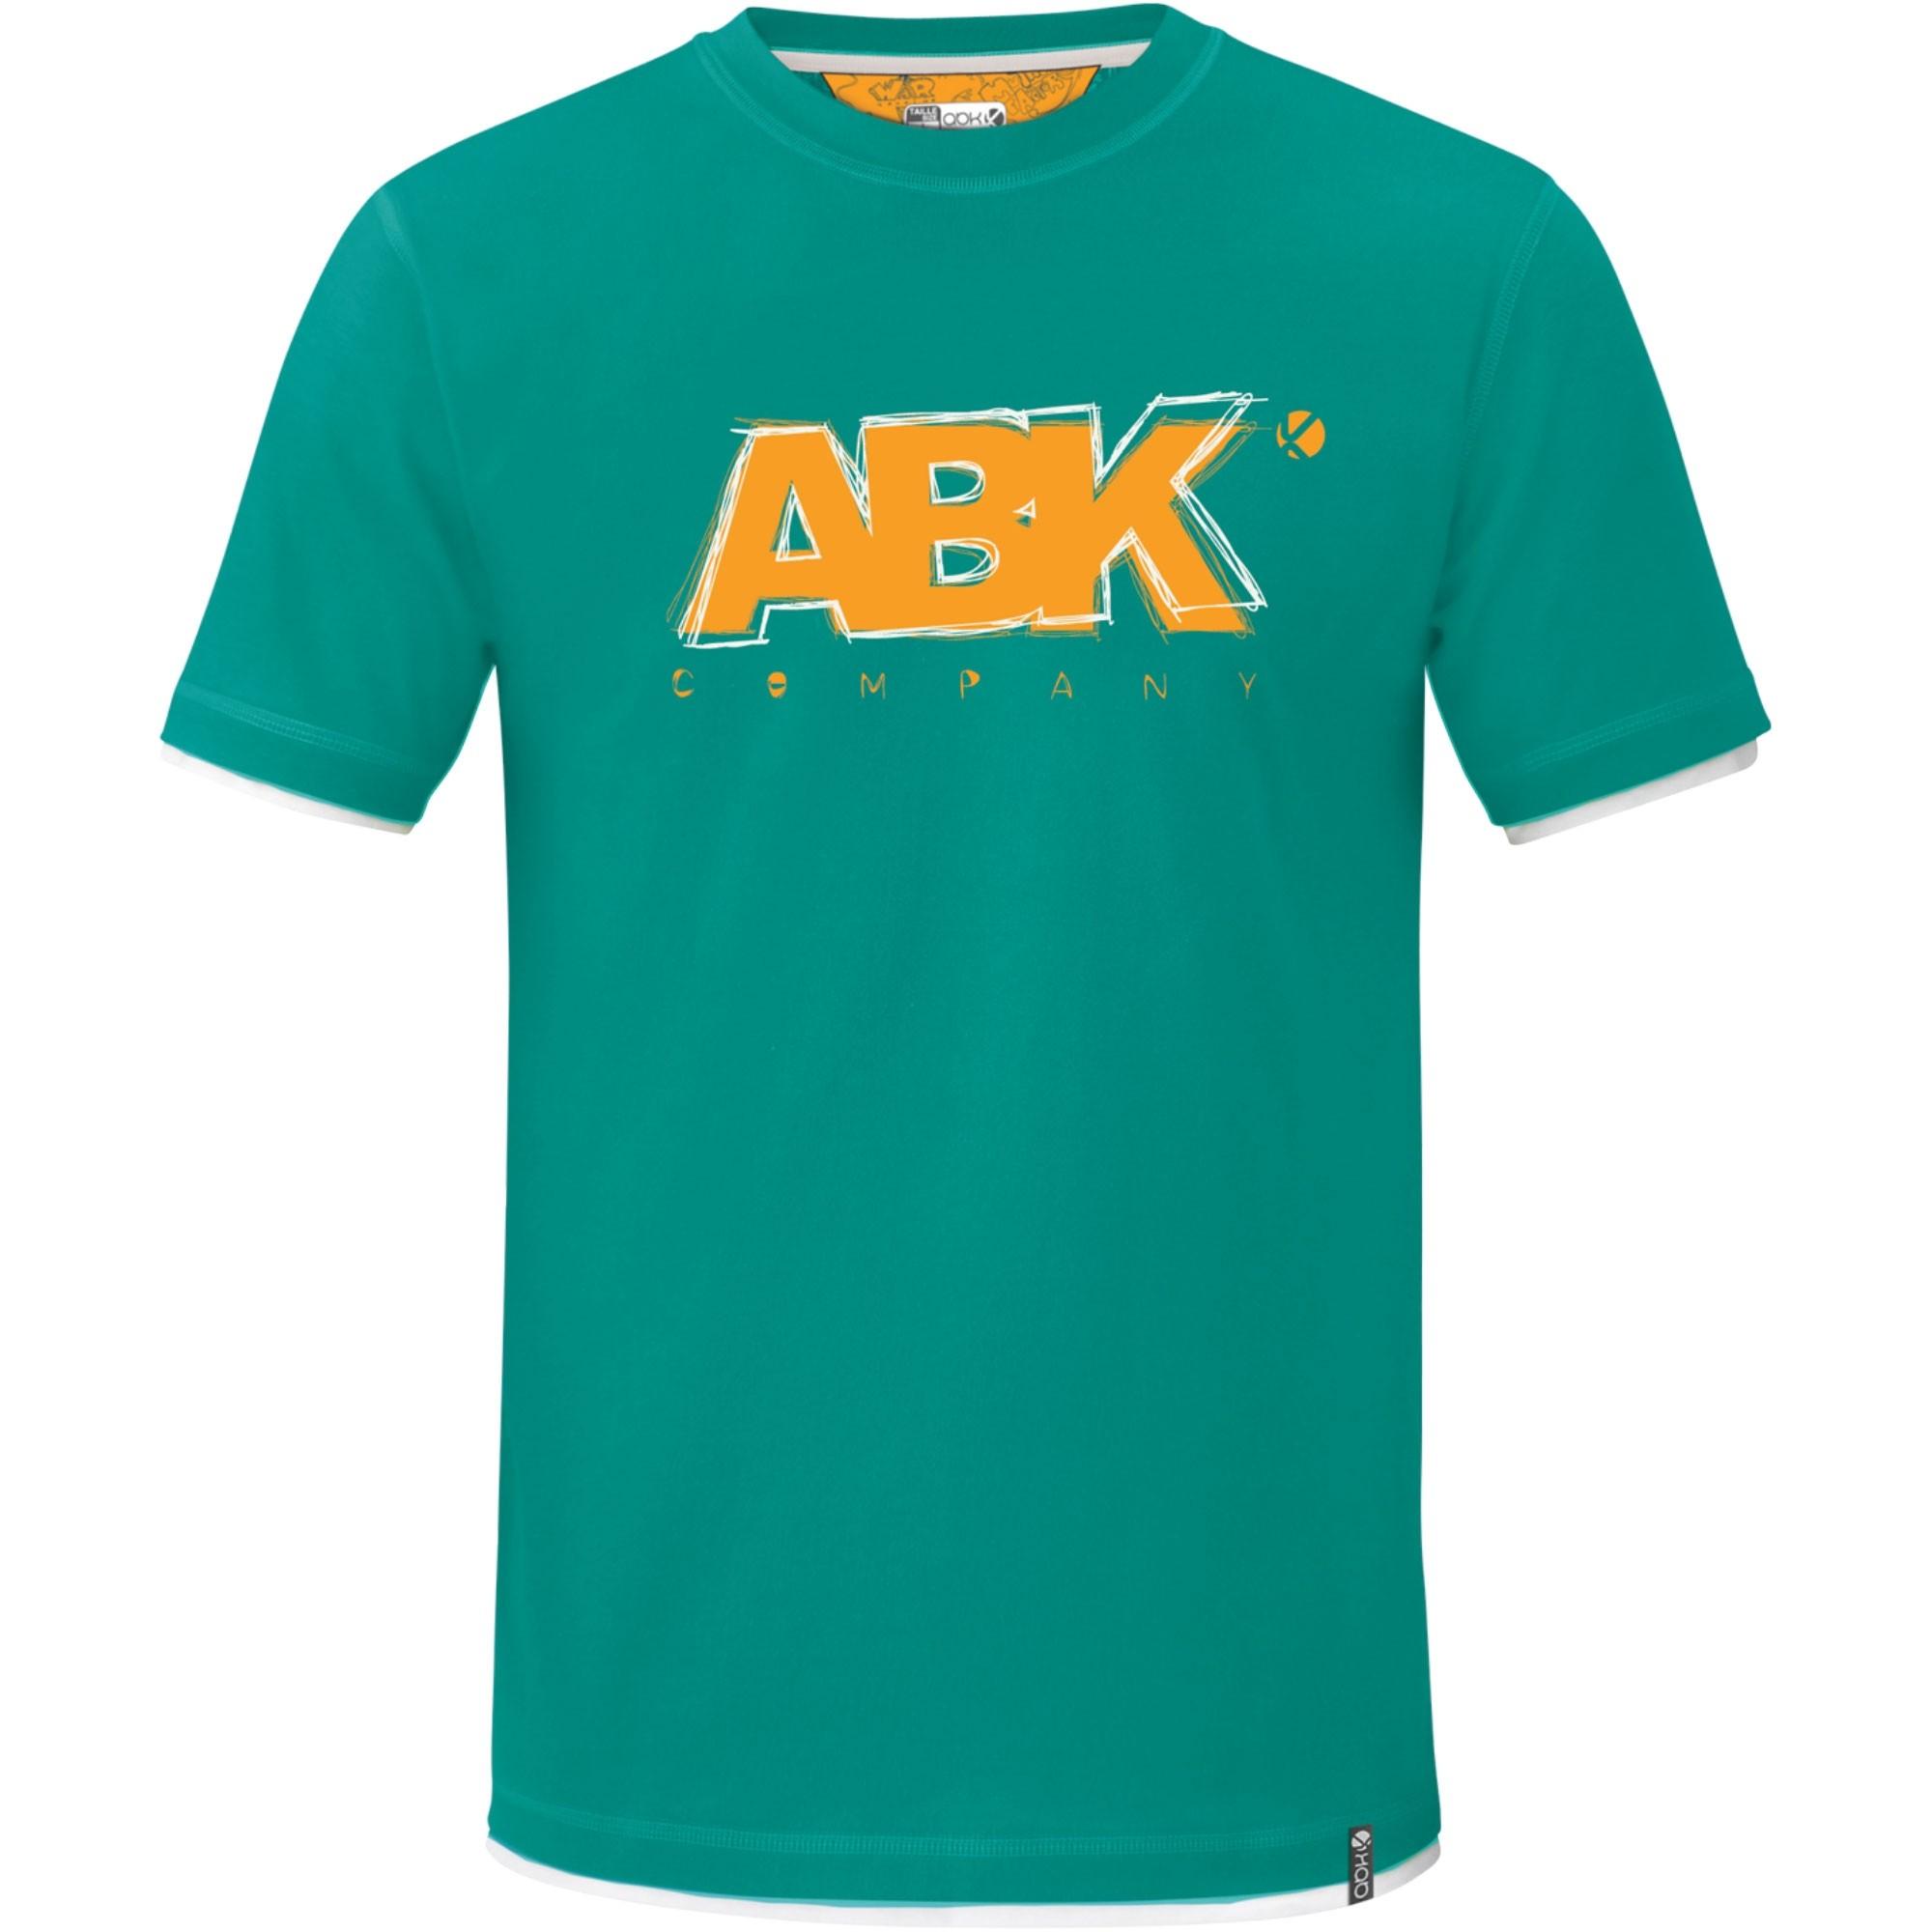 ABK-Goody-Tee-M-Mediterranean-W17